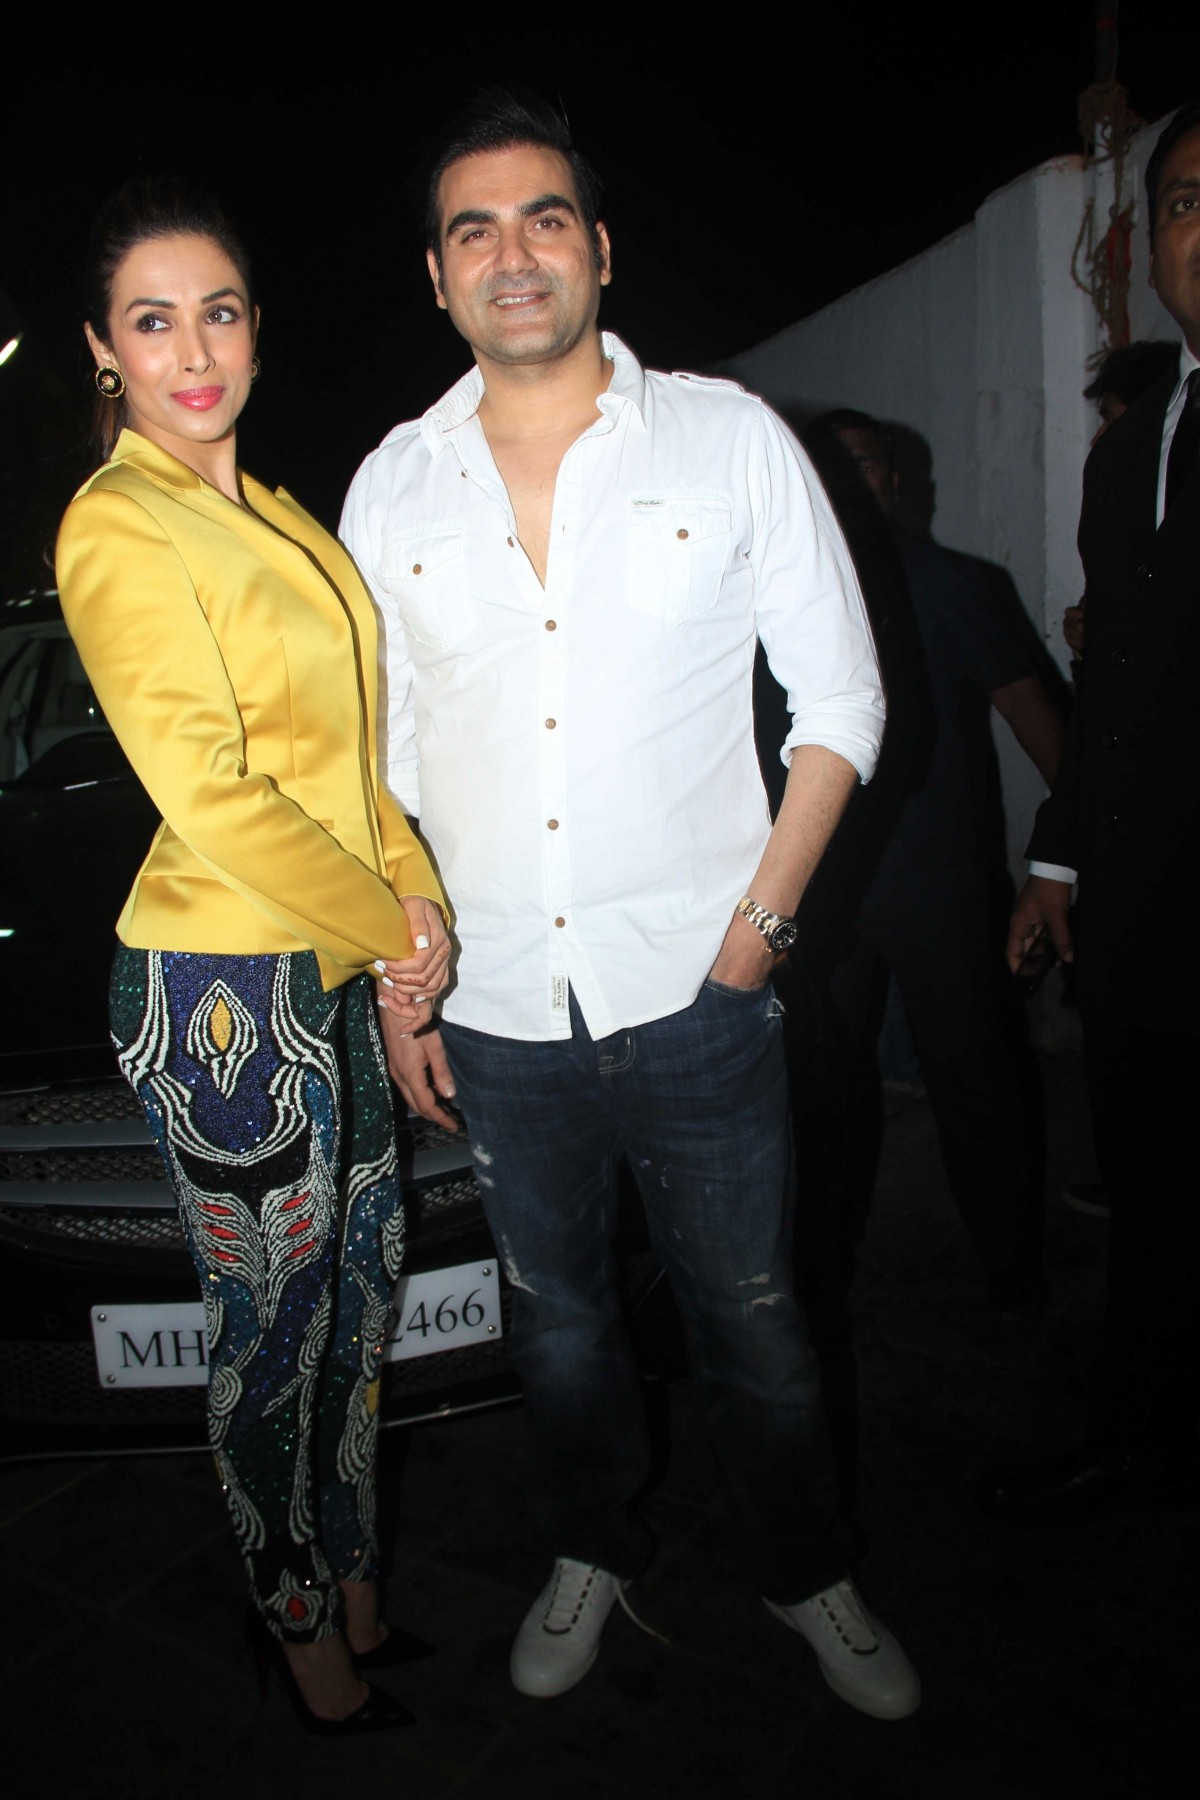 Arbaaz Khan and Malaika Arora Khan during